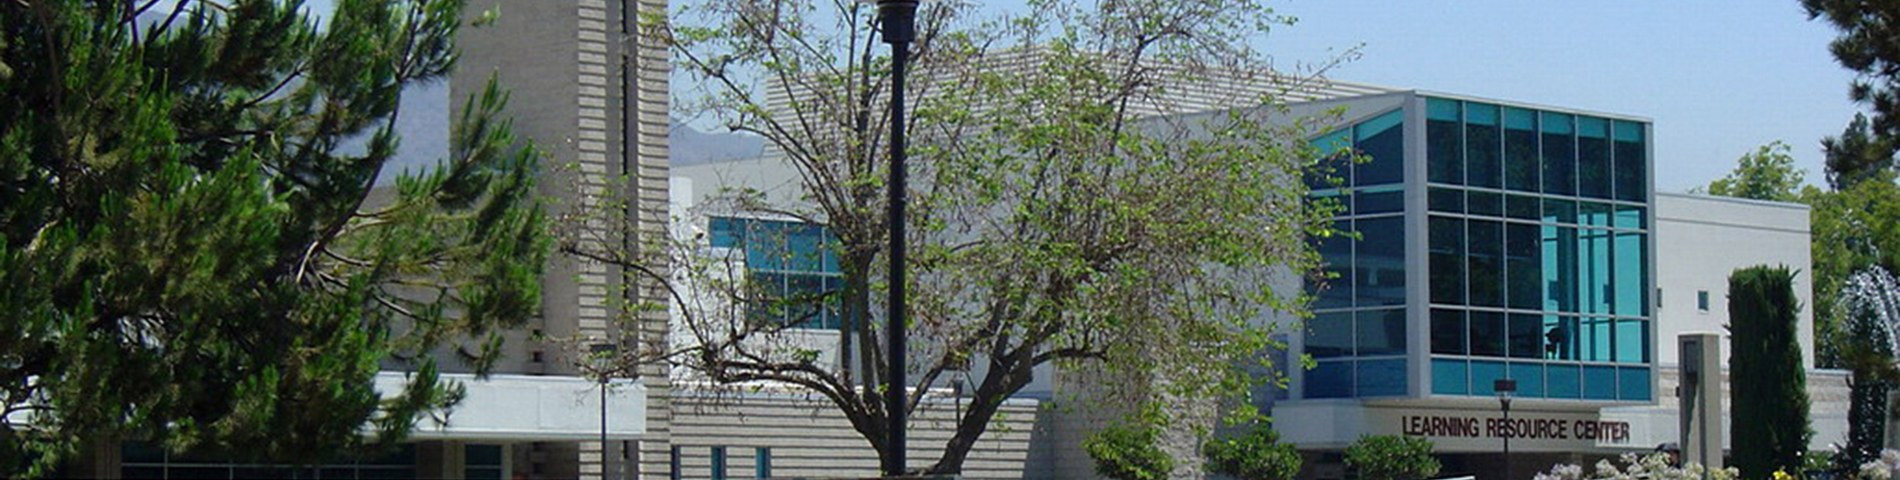 FLS Citrus College зображення 1